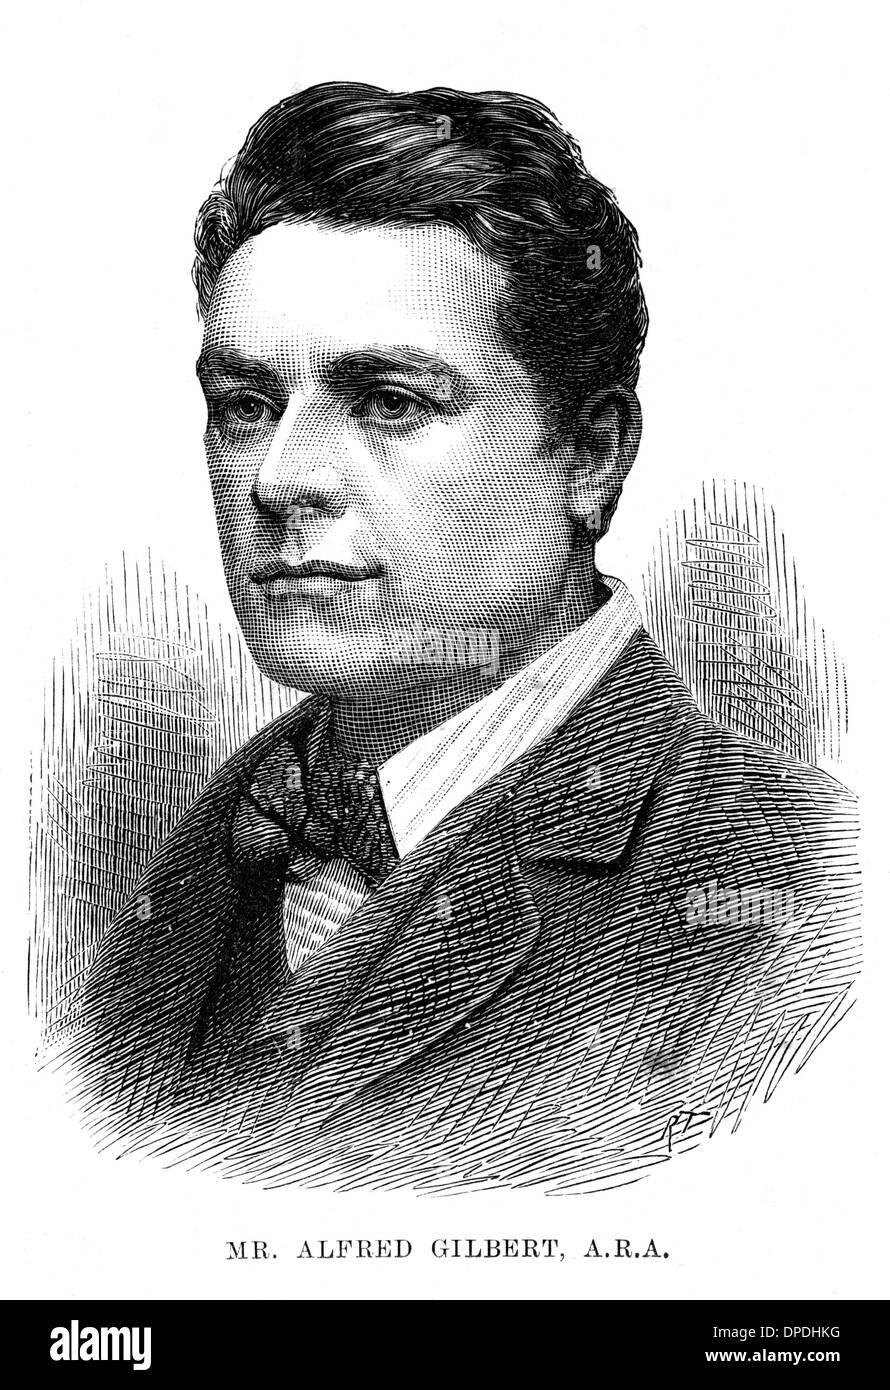 SIR ALFRED GILBERT - 2 - Stock Image